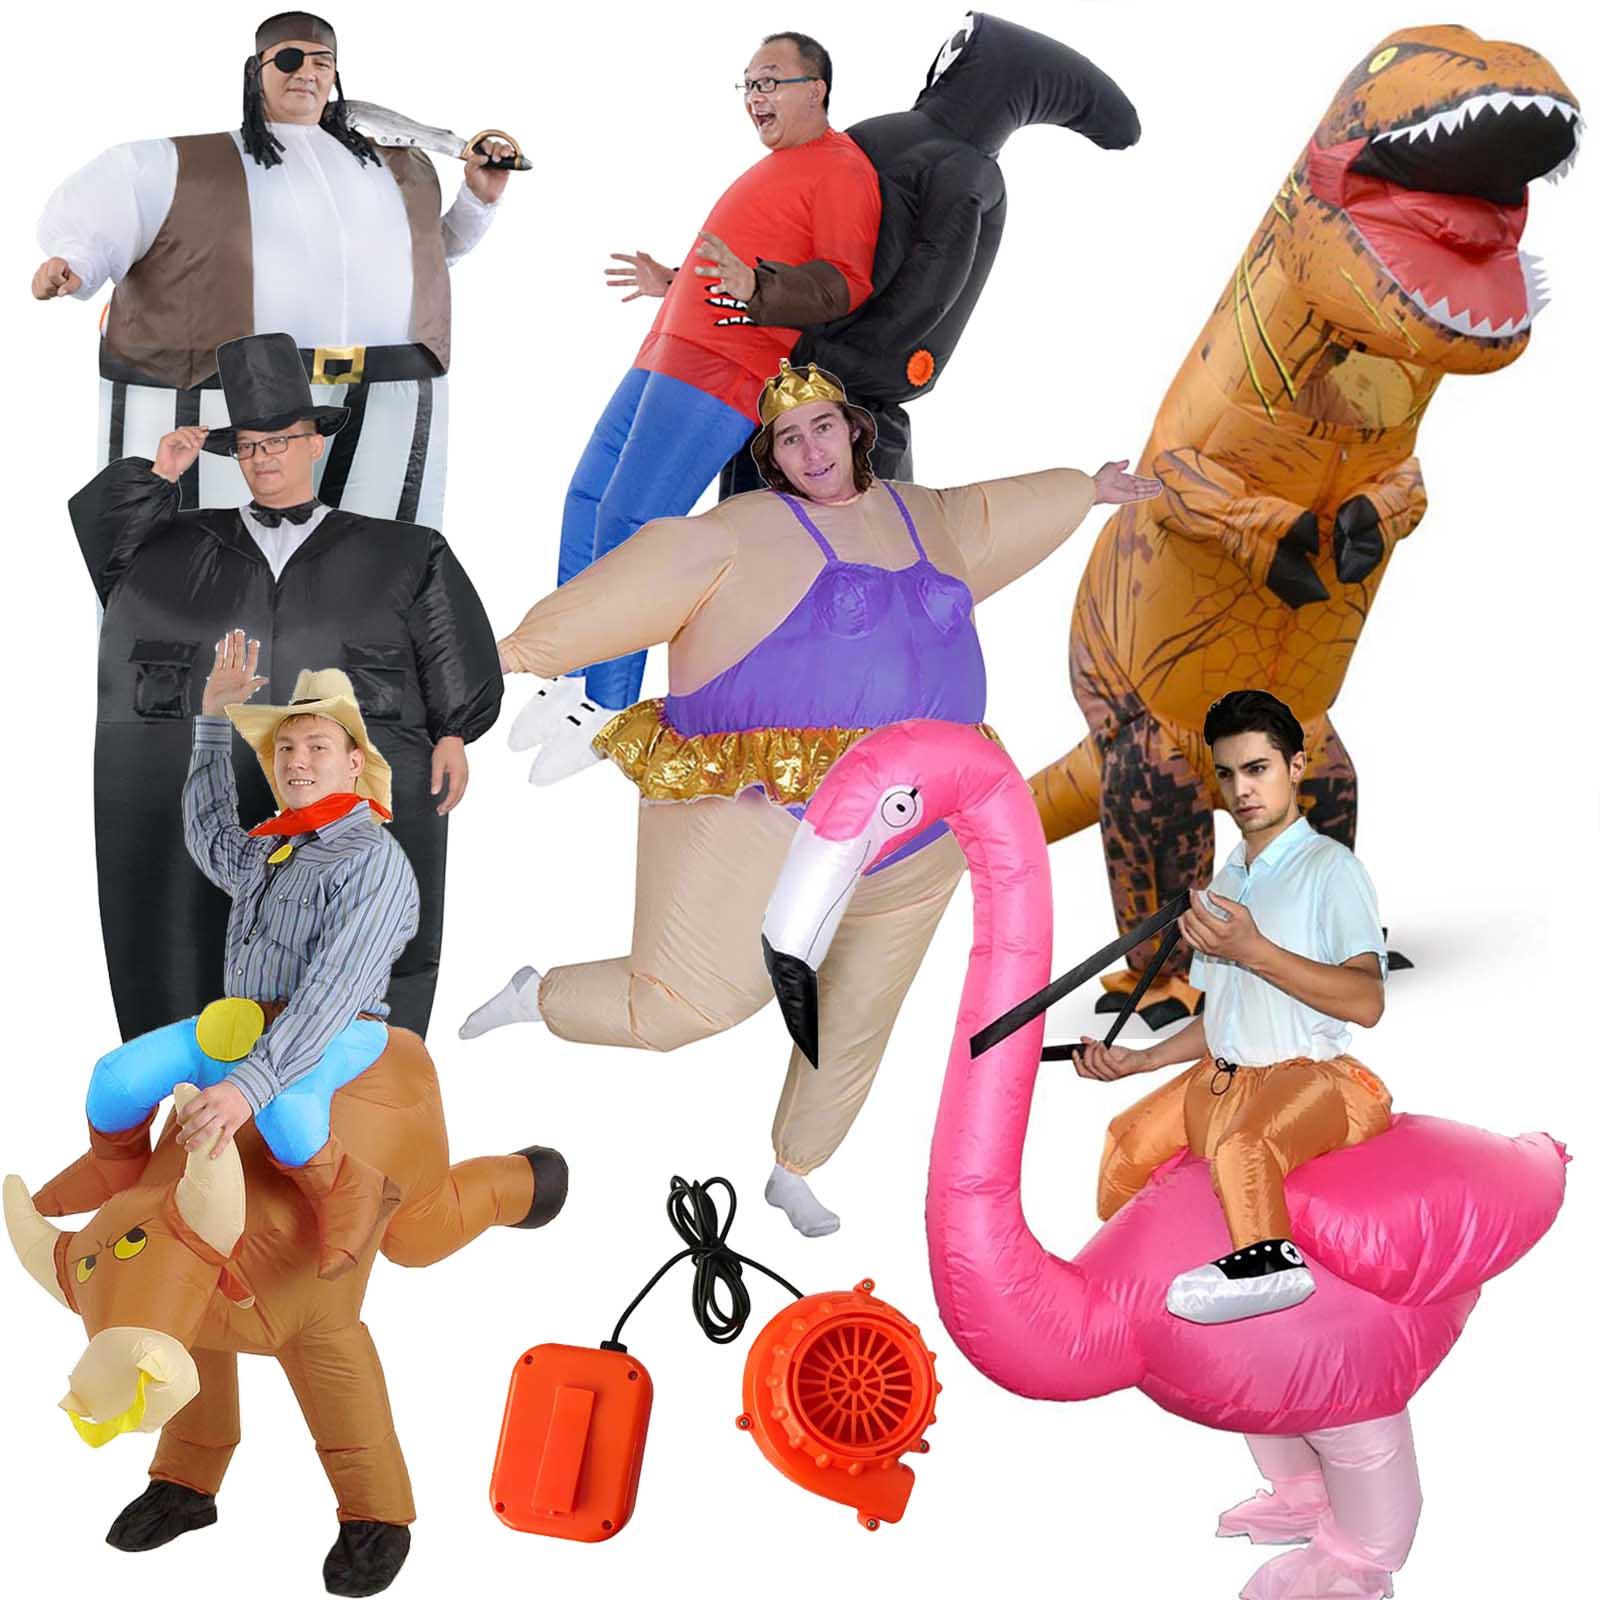 Adult Inflatable Centaur Costume Funny Half Horse Blow Up Suit Rex T-Rex Party